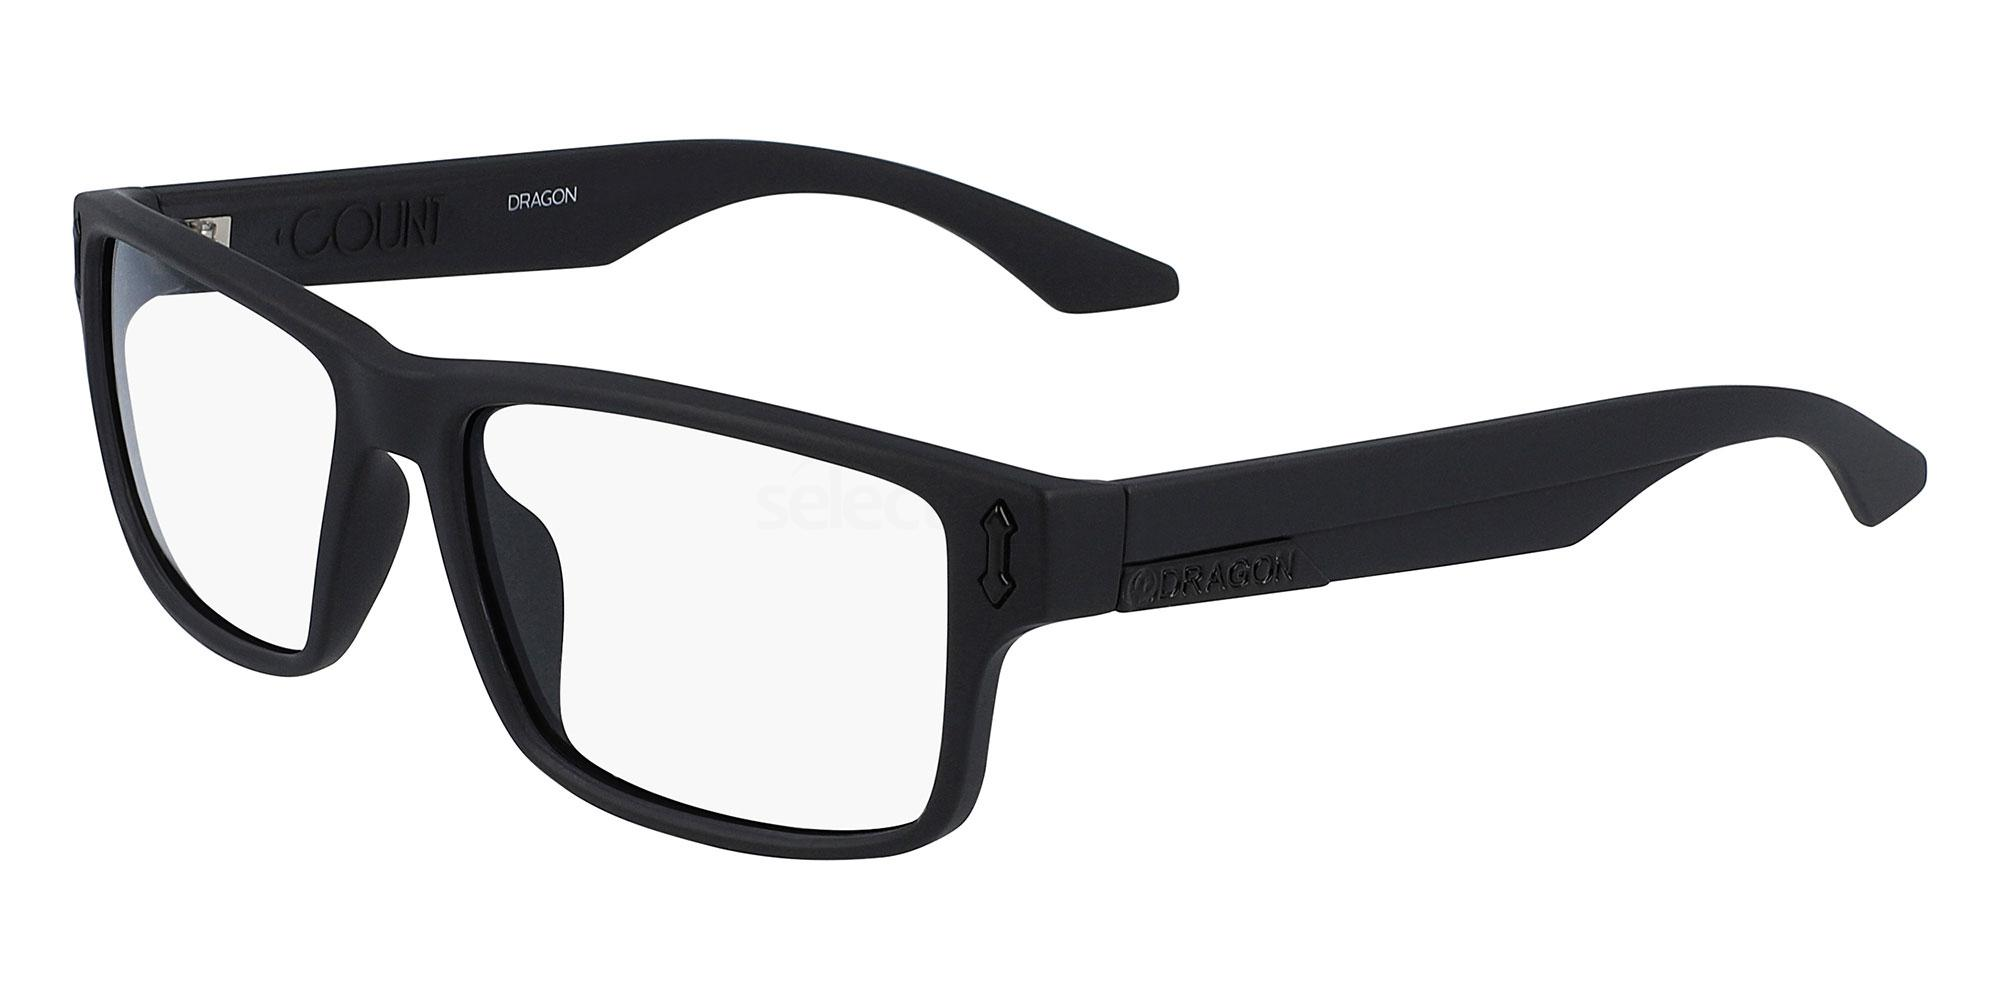 002 DR194 COUNT SM Glasses, Dragon